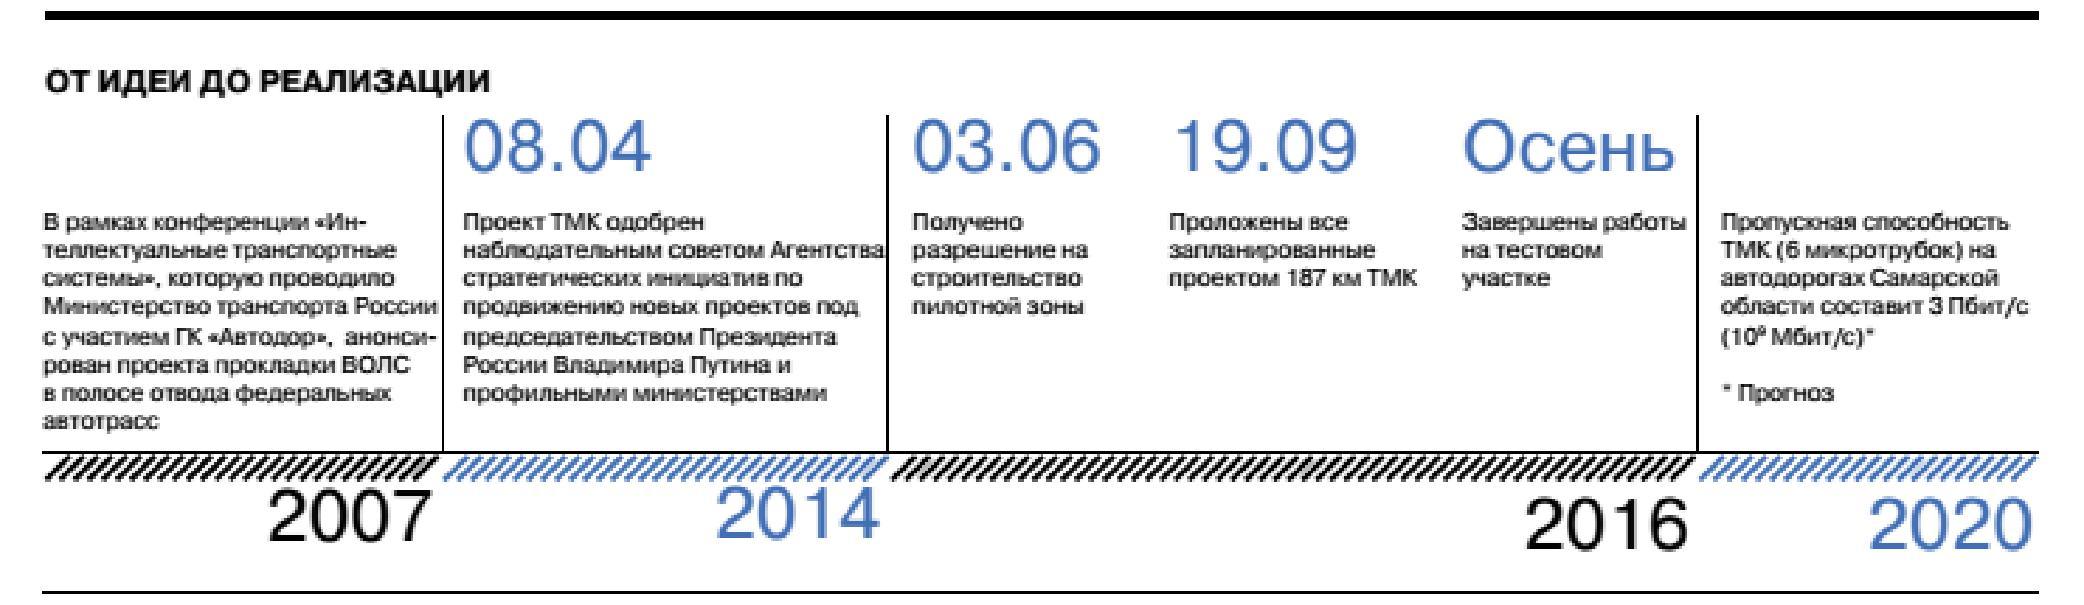 СМАТРС № 10 К 1.1